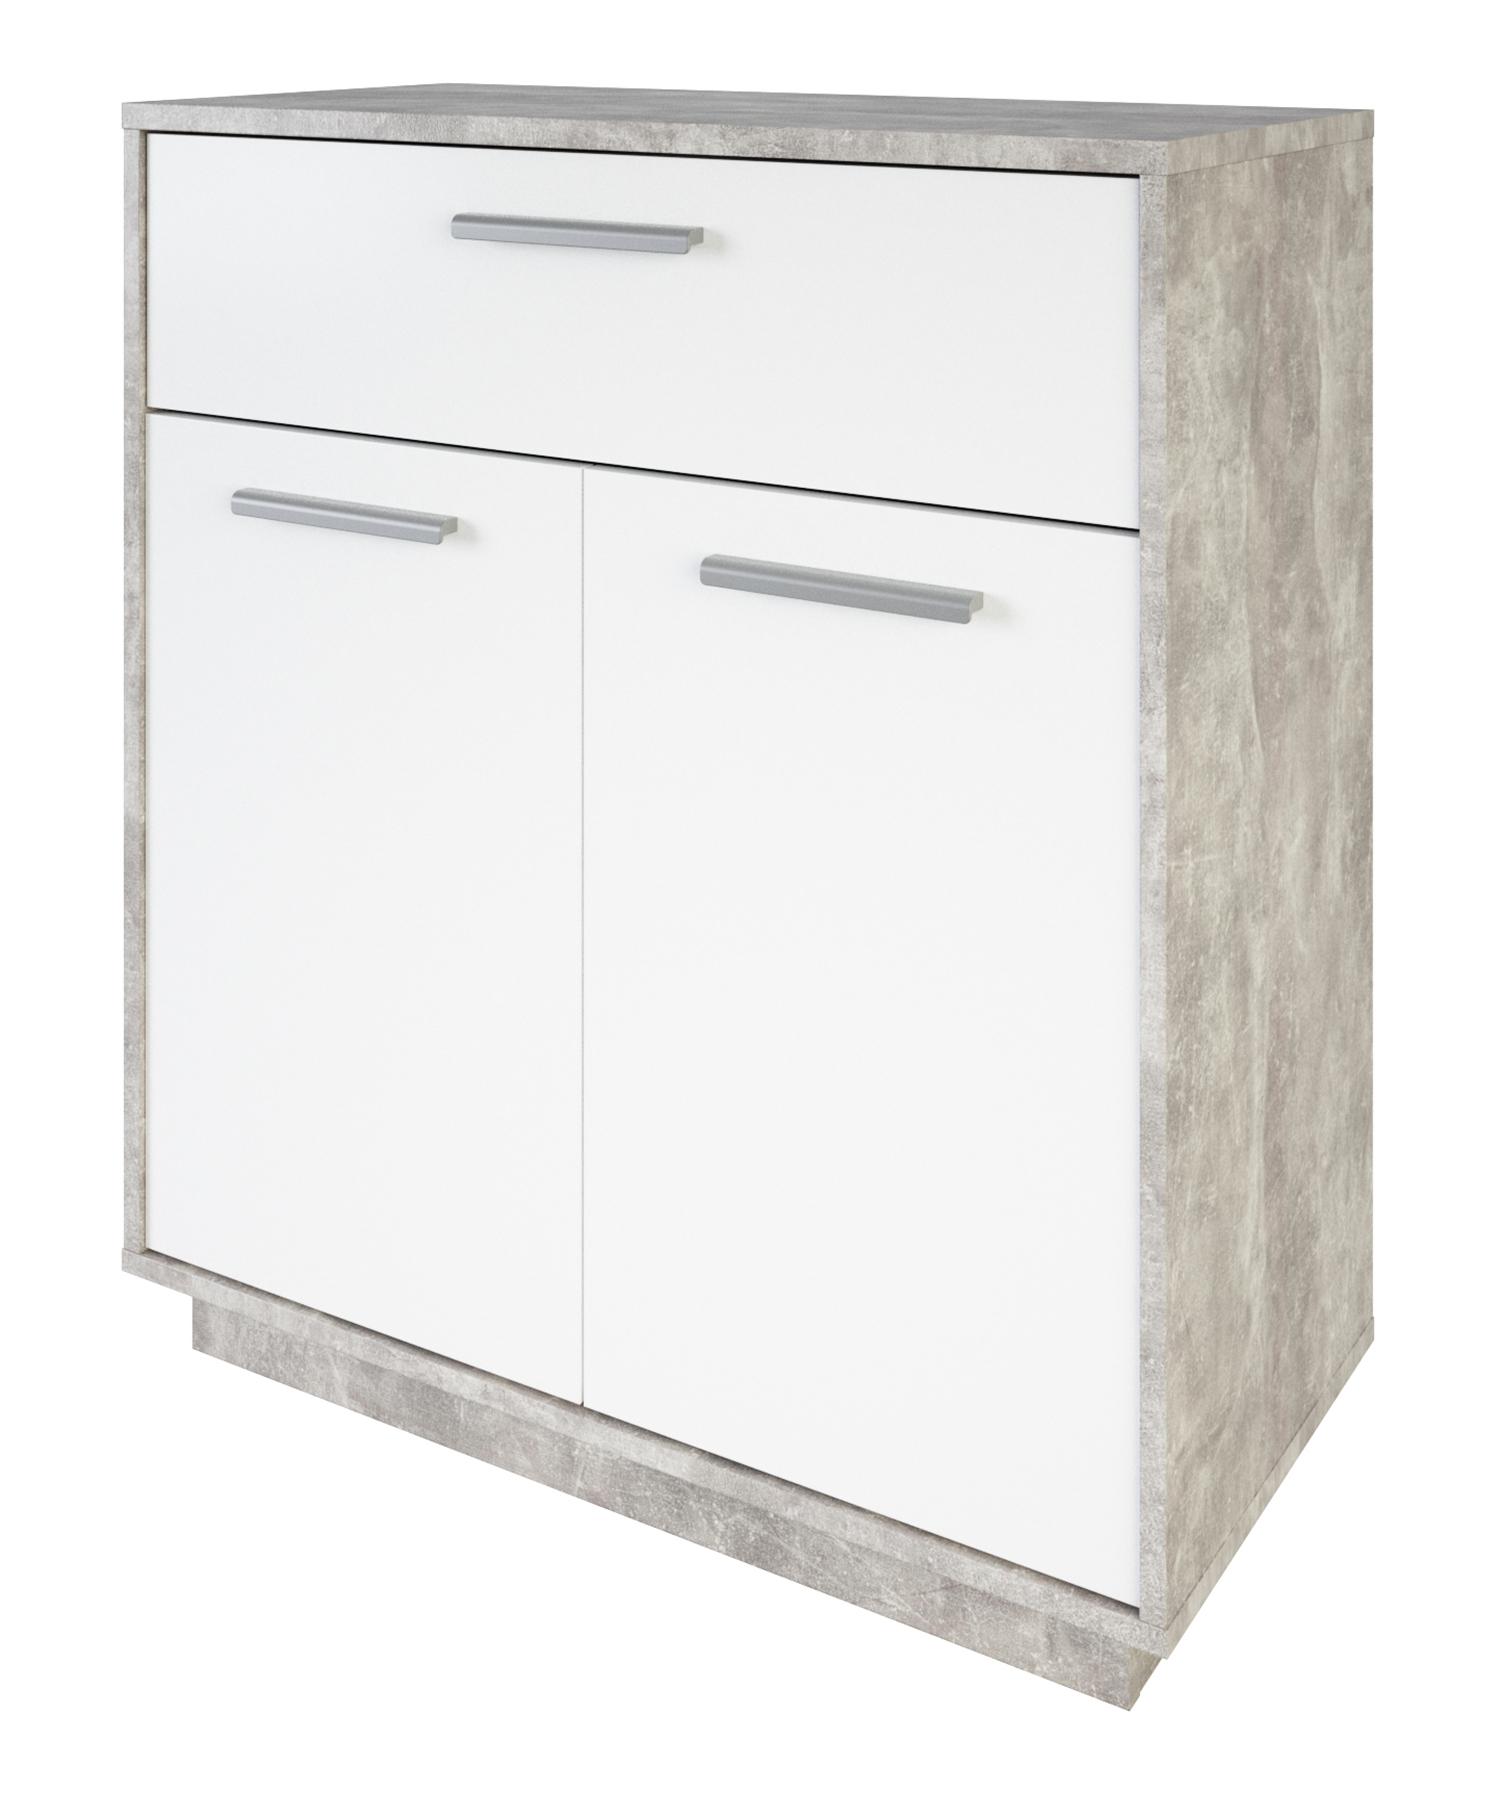 Kommode Ivo 2 weiß / grau